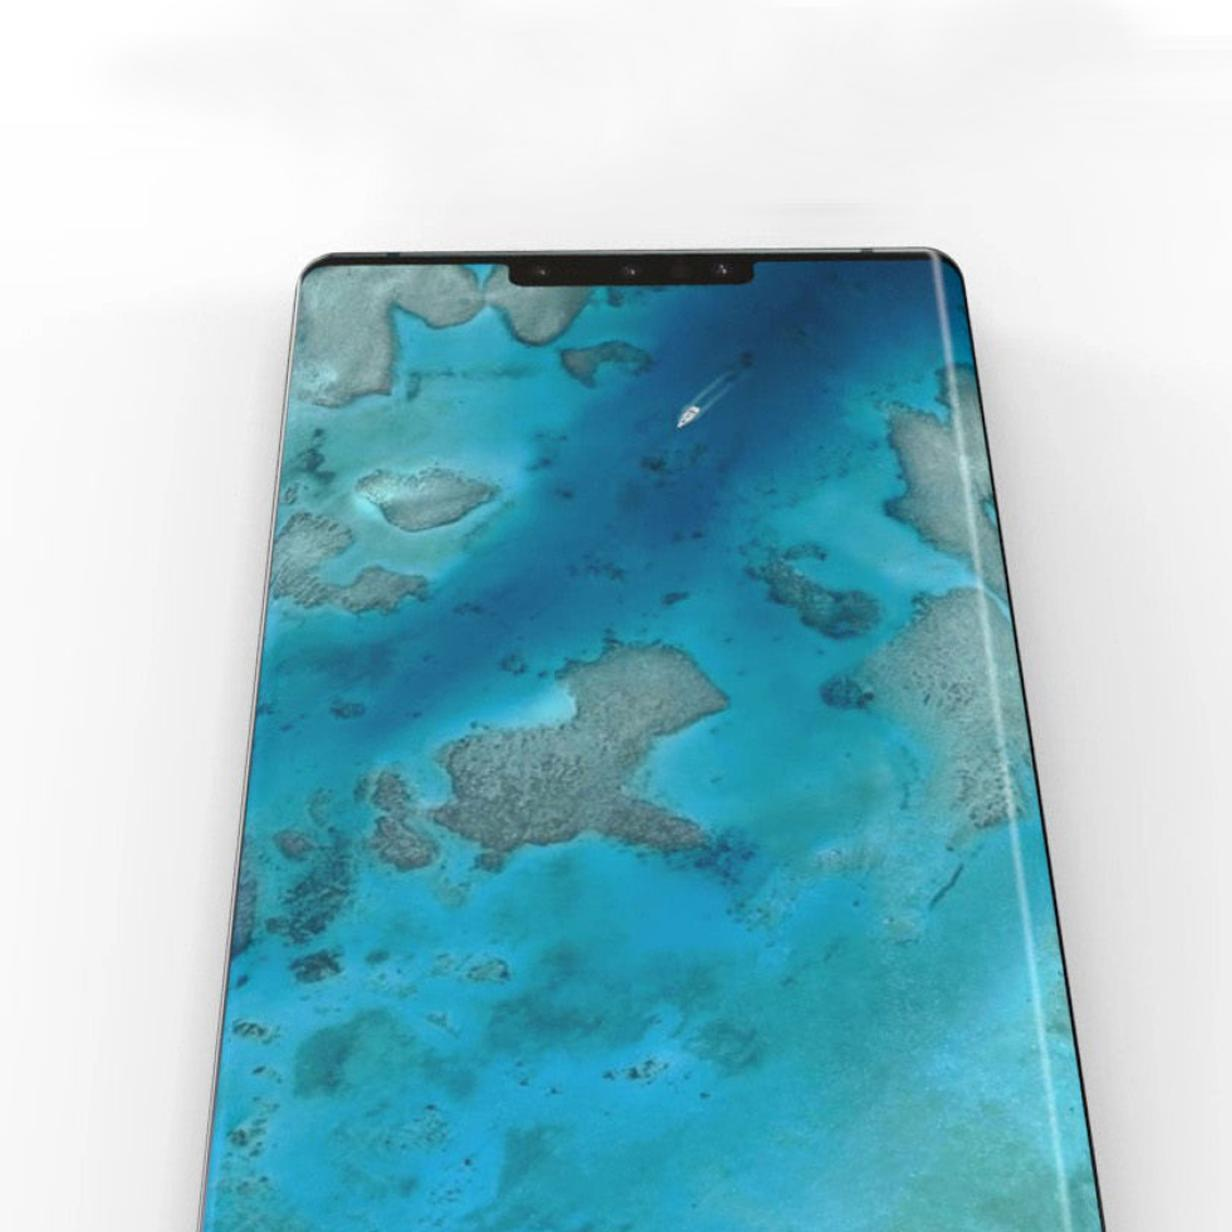 Fotos: Huawei Mate 30 Pro hat extrem gebogenen Bildschirm